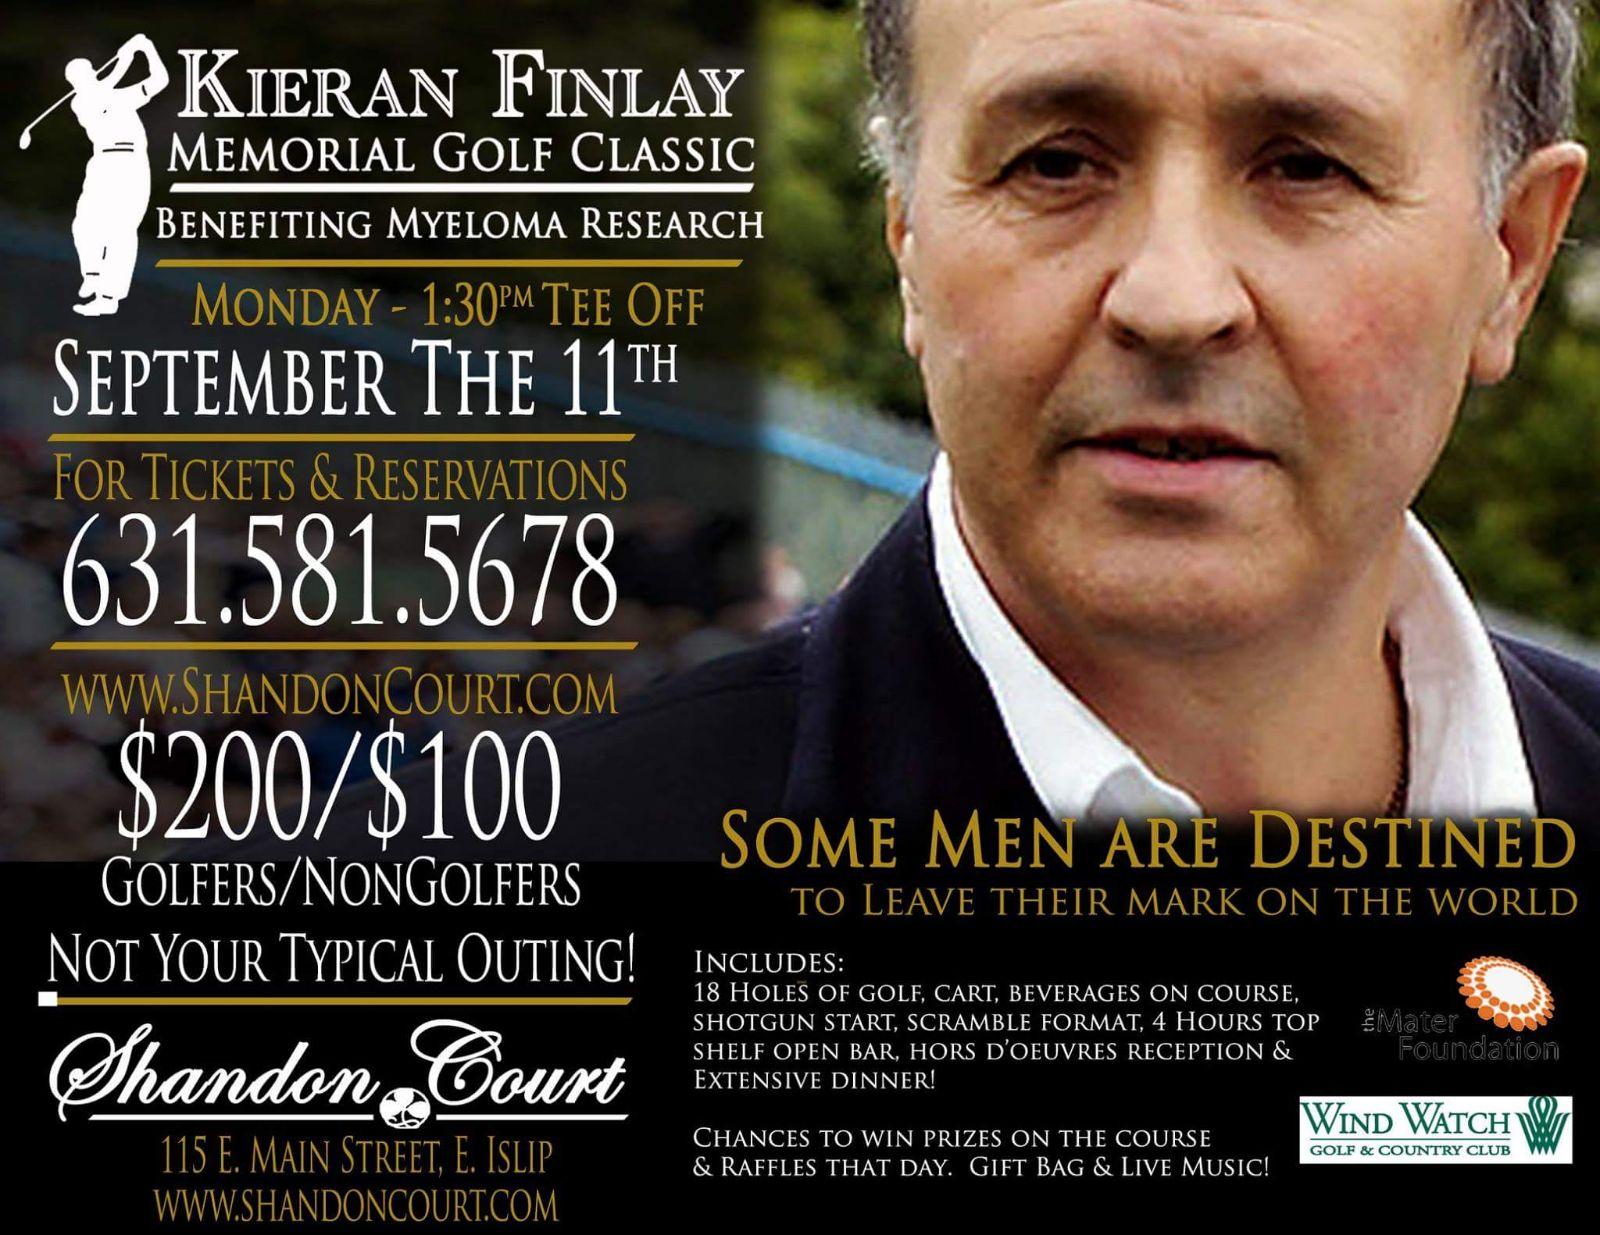 Kieran Finlay Memorial Classic